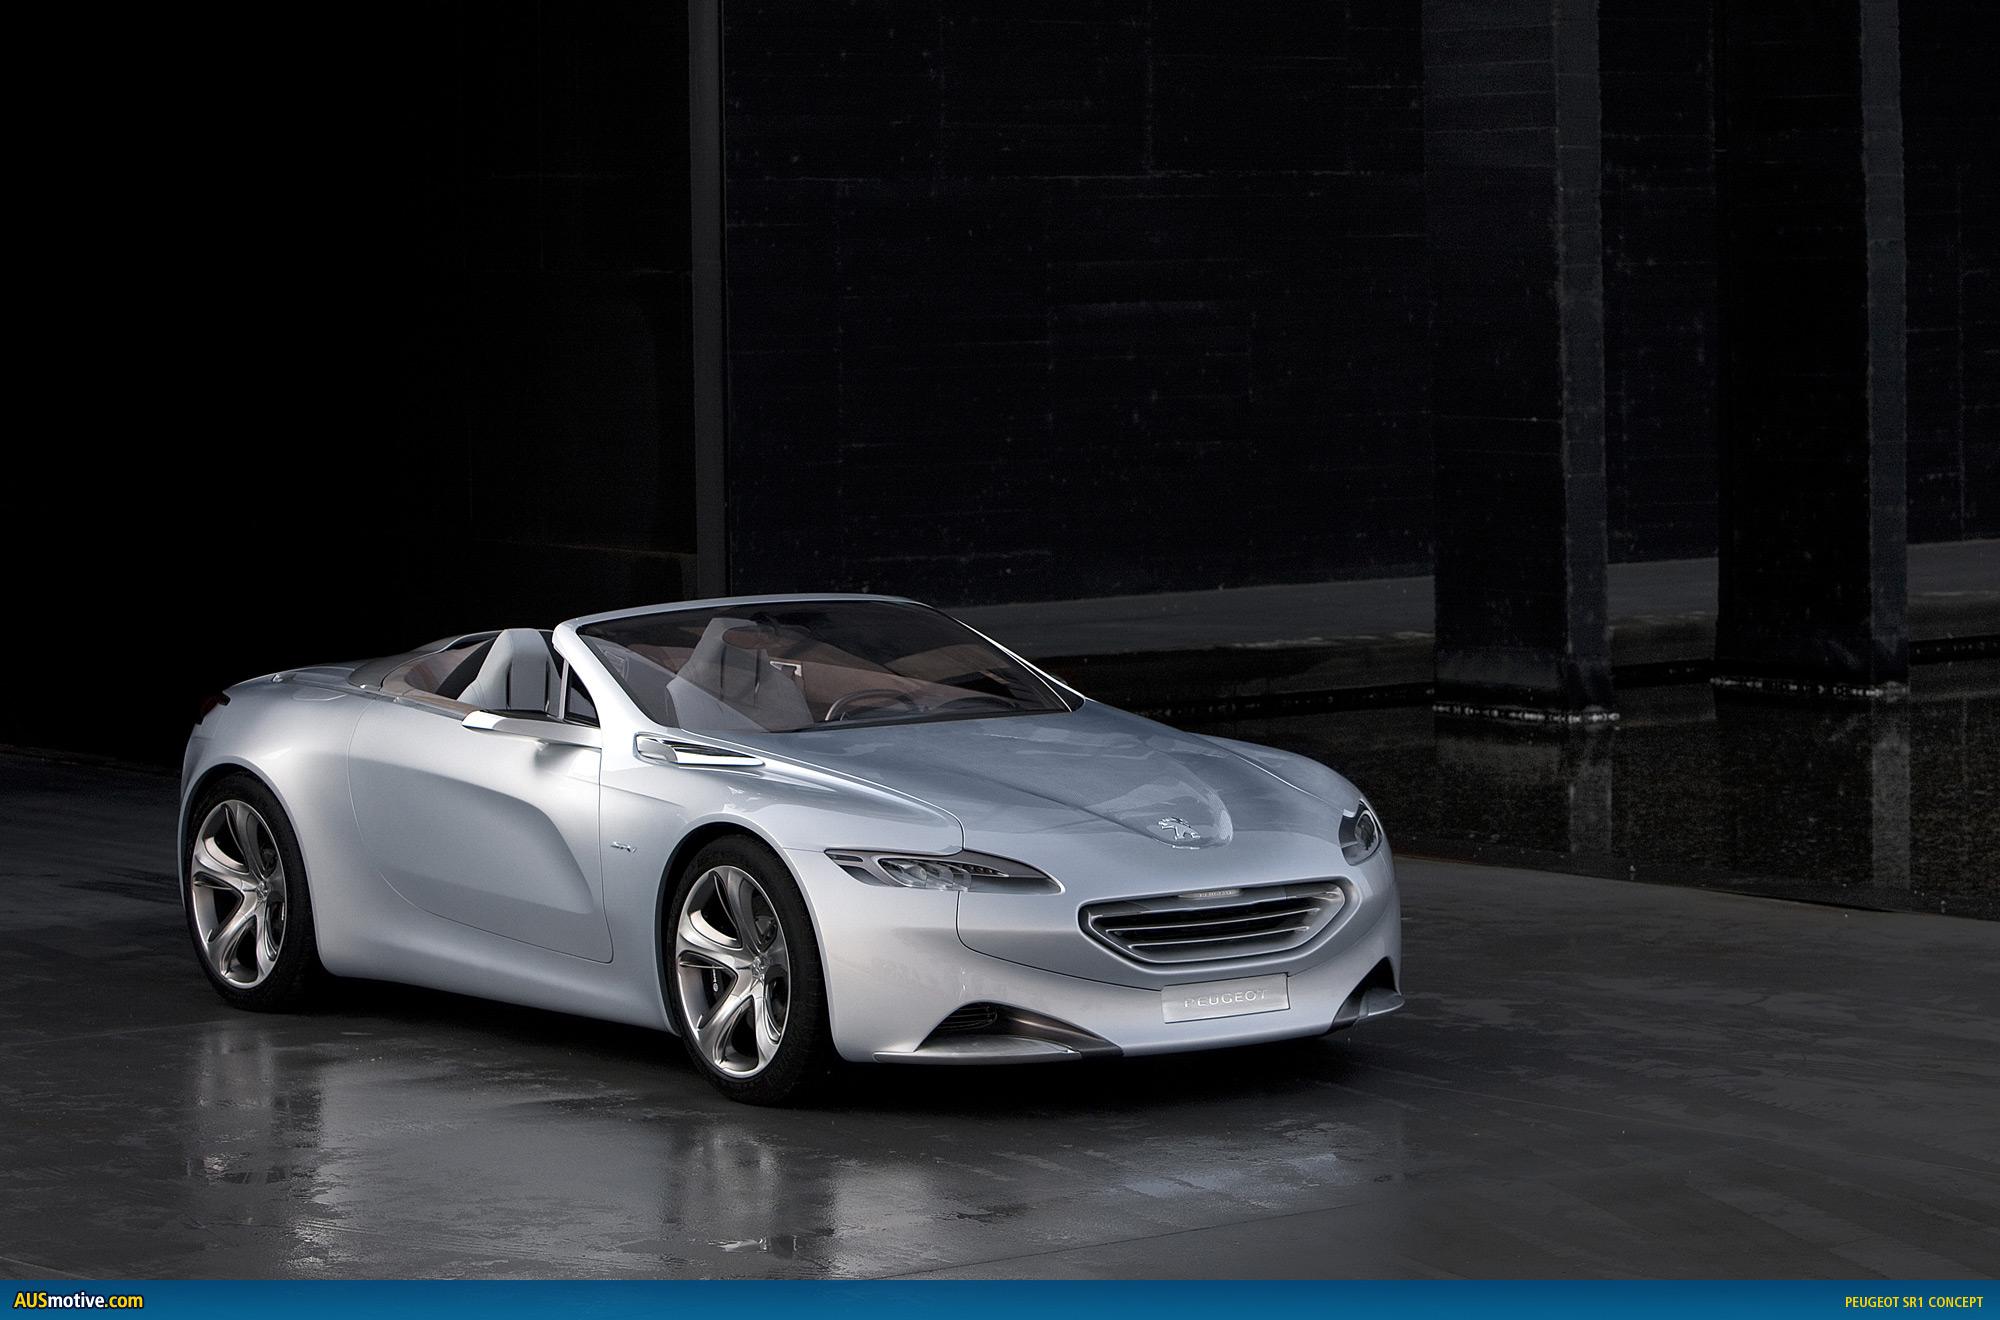 Peugeot SR1 Images